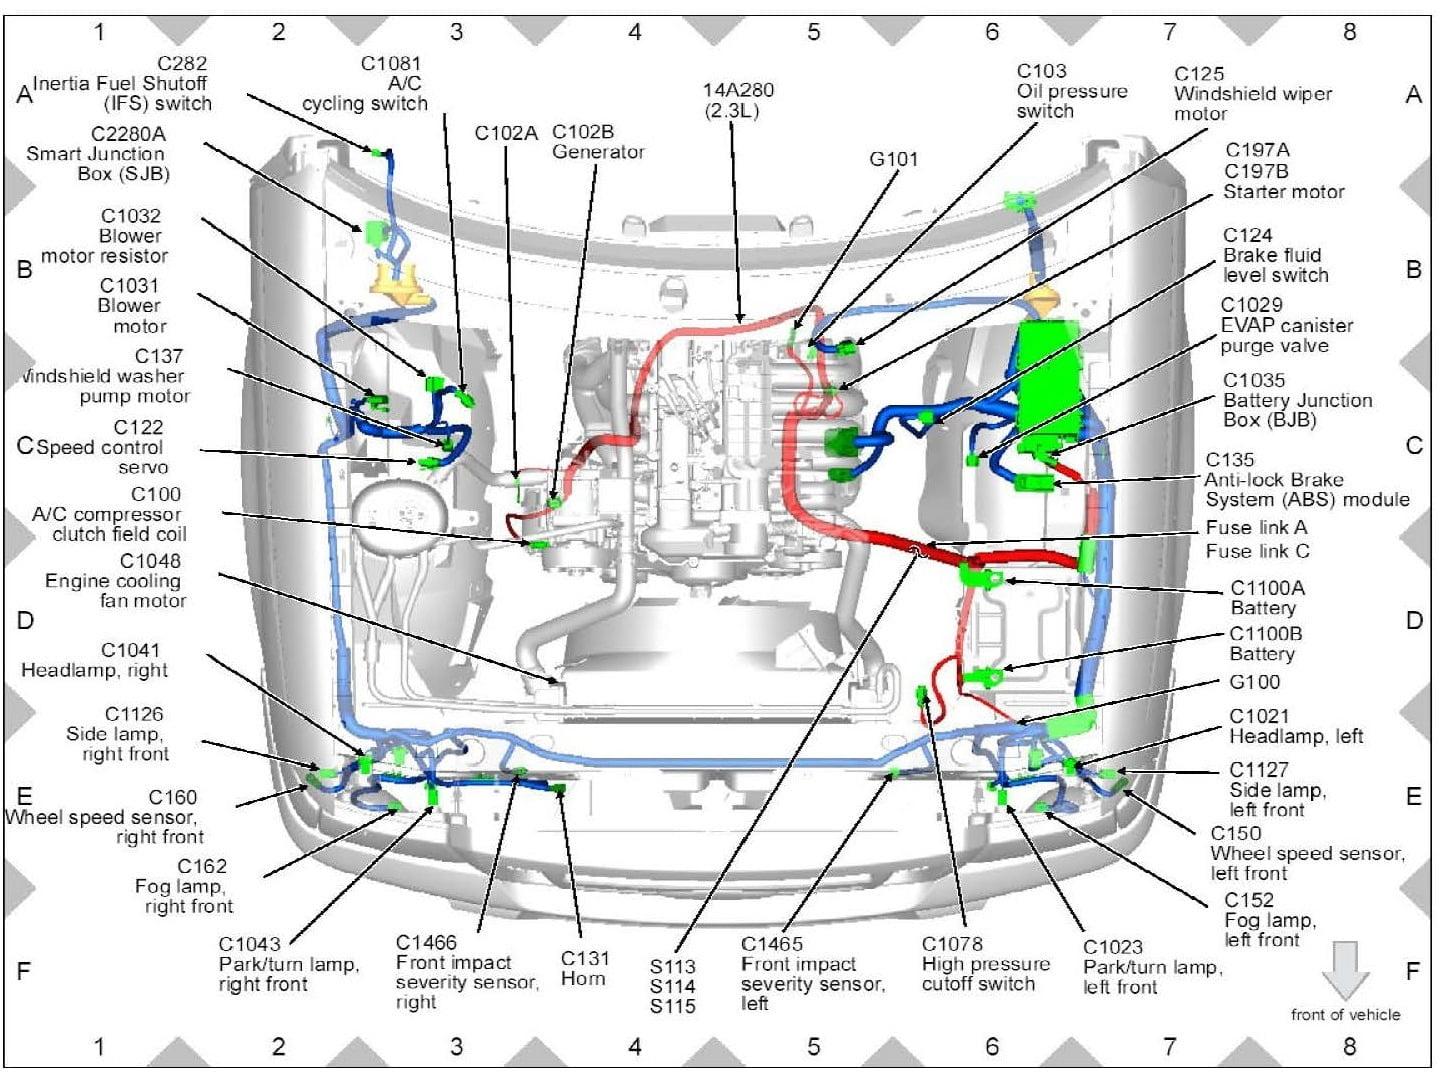 Fuel Pump for 2000 FORD RANGER V6-4.0L | Ford Ranger V6 Engine Diagram |  | Hampton Roads Pediatric Dentistry